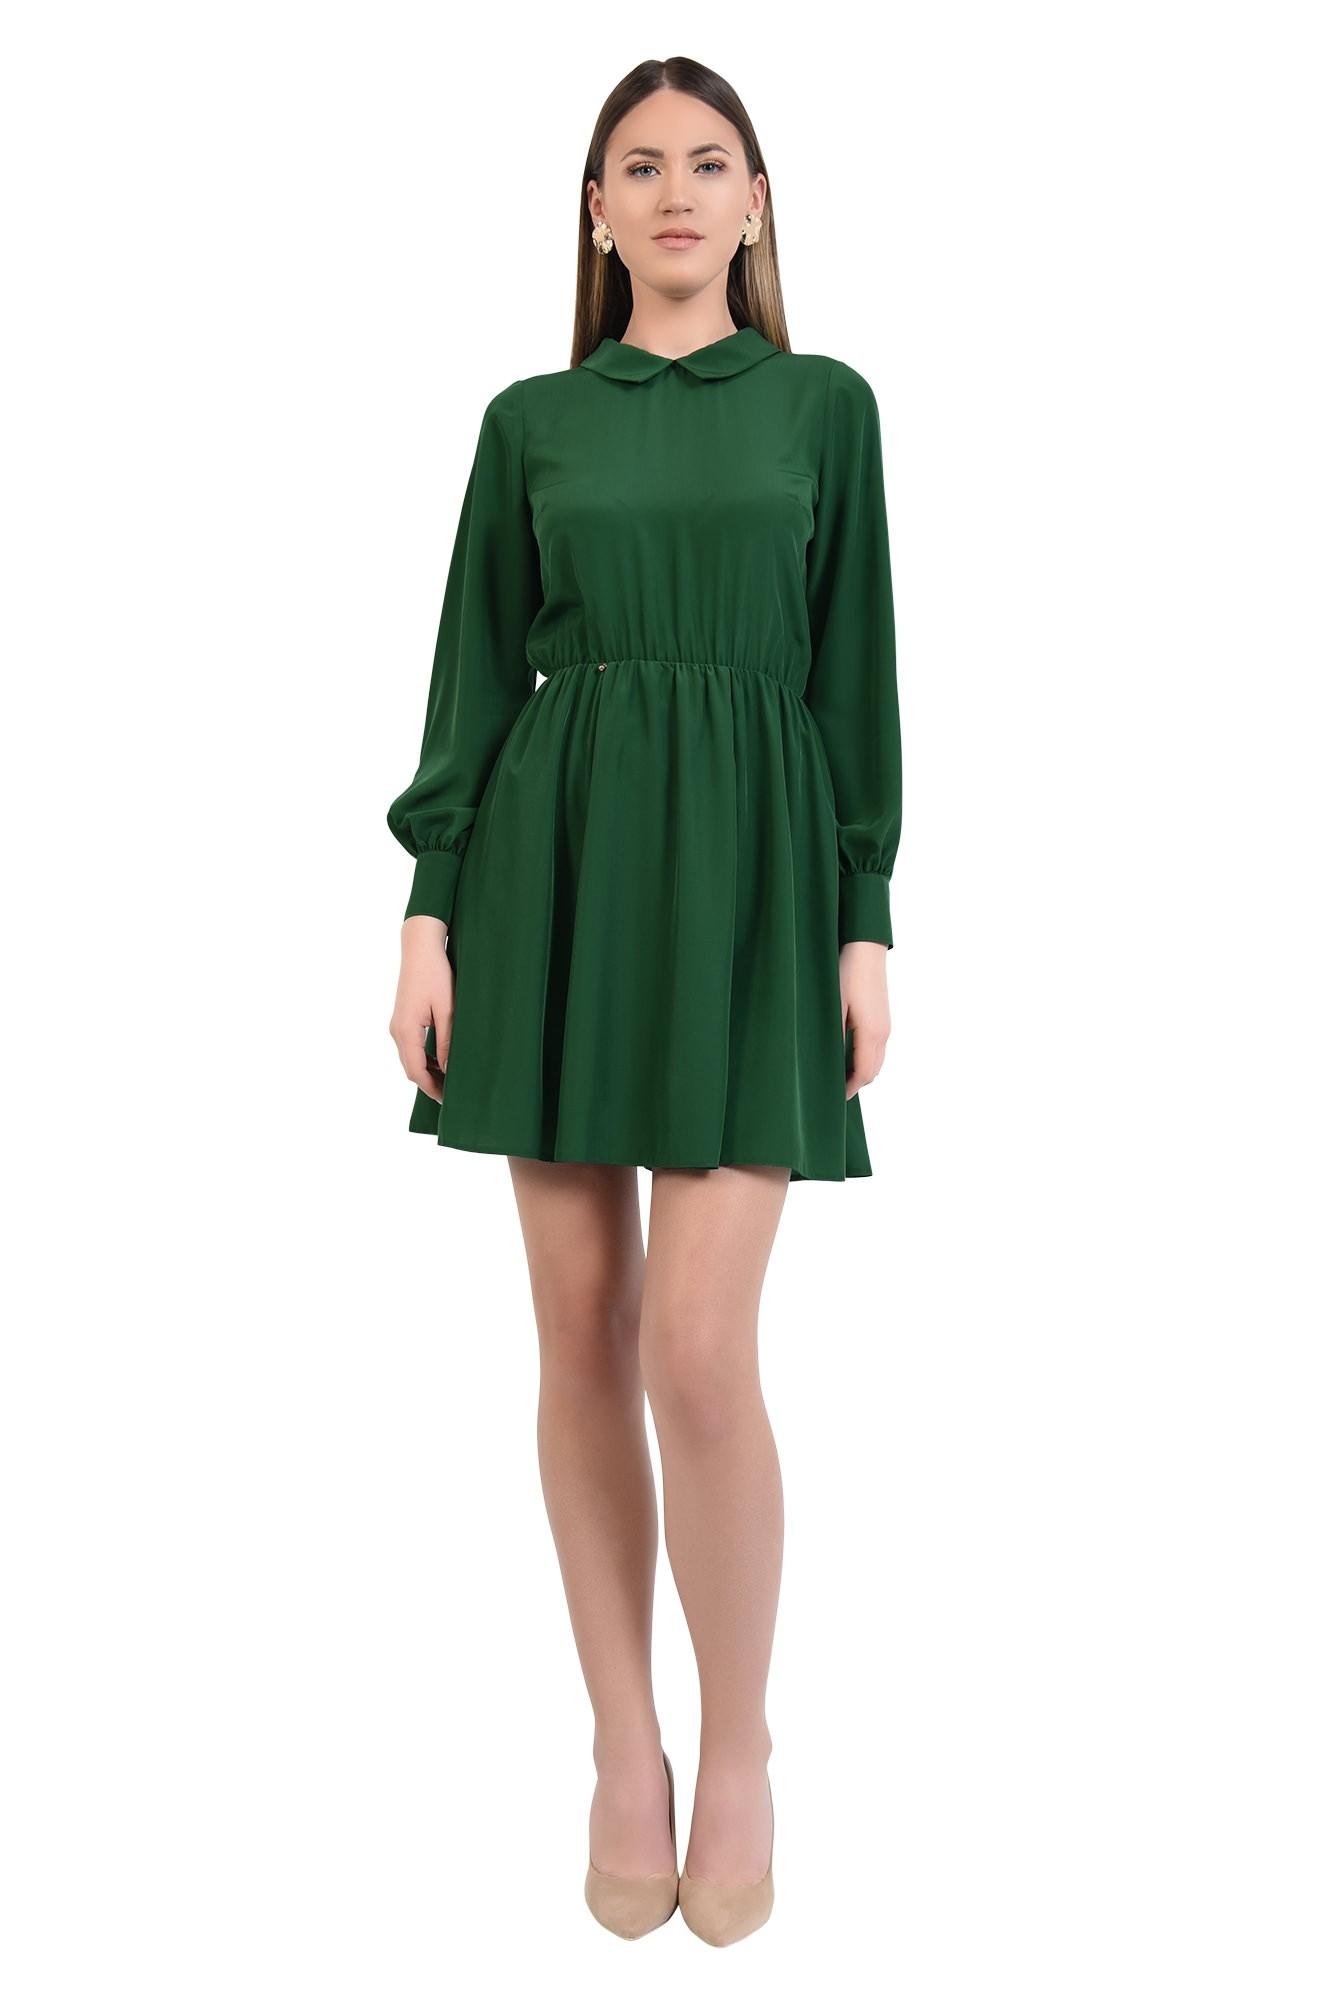 rochie scurta, evazata, clos, talie pe elastic, guler